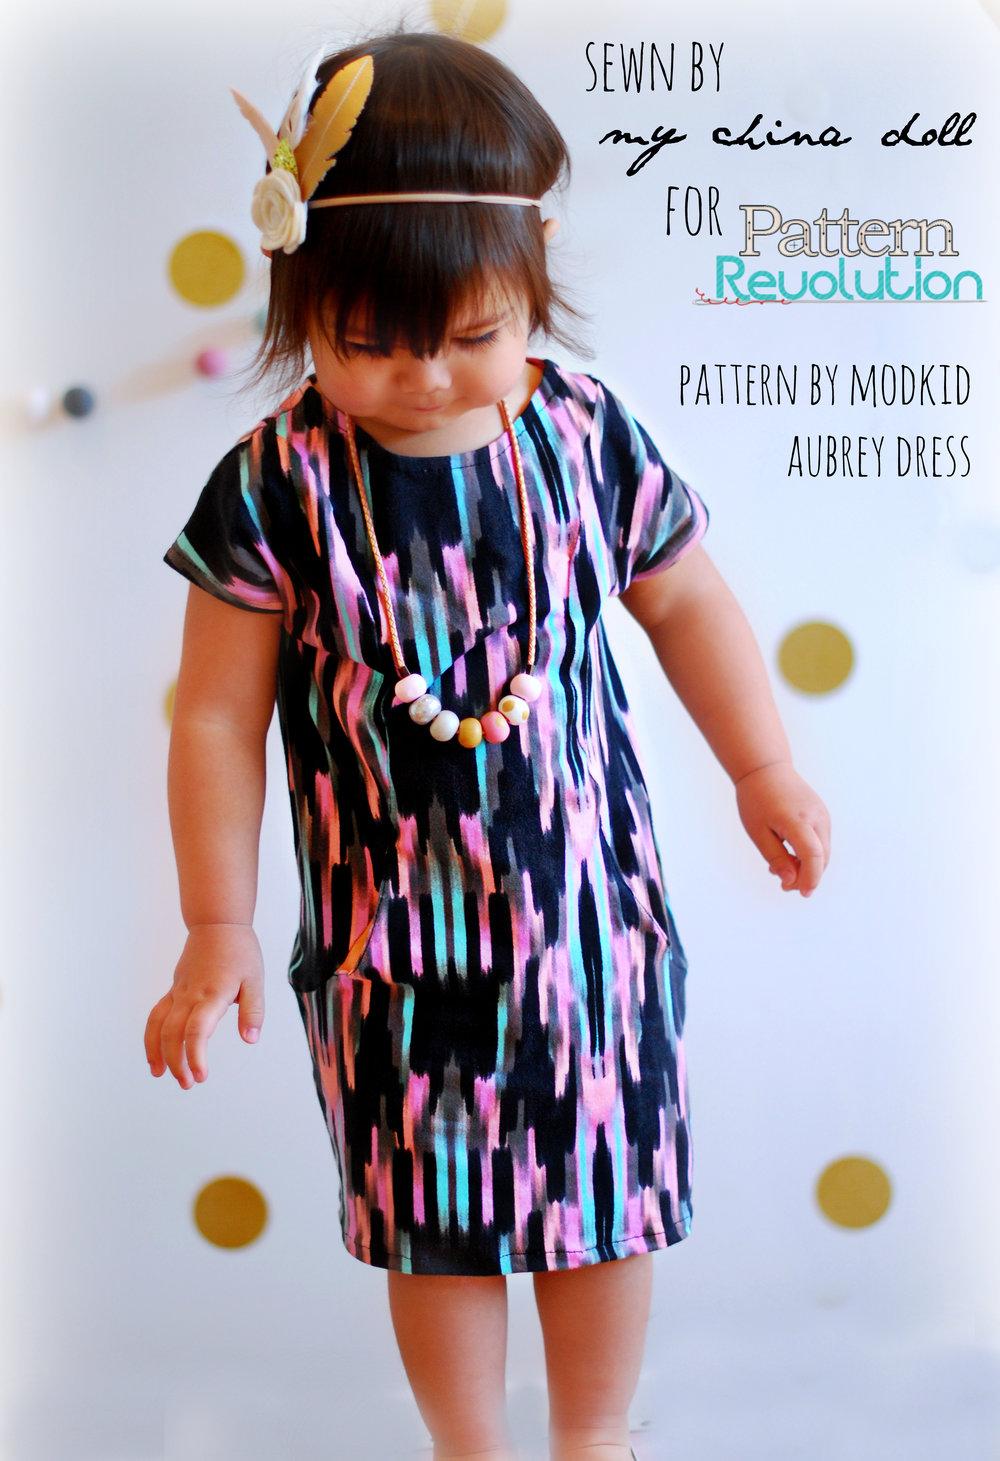 aubrey dress cover page.jpg